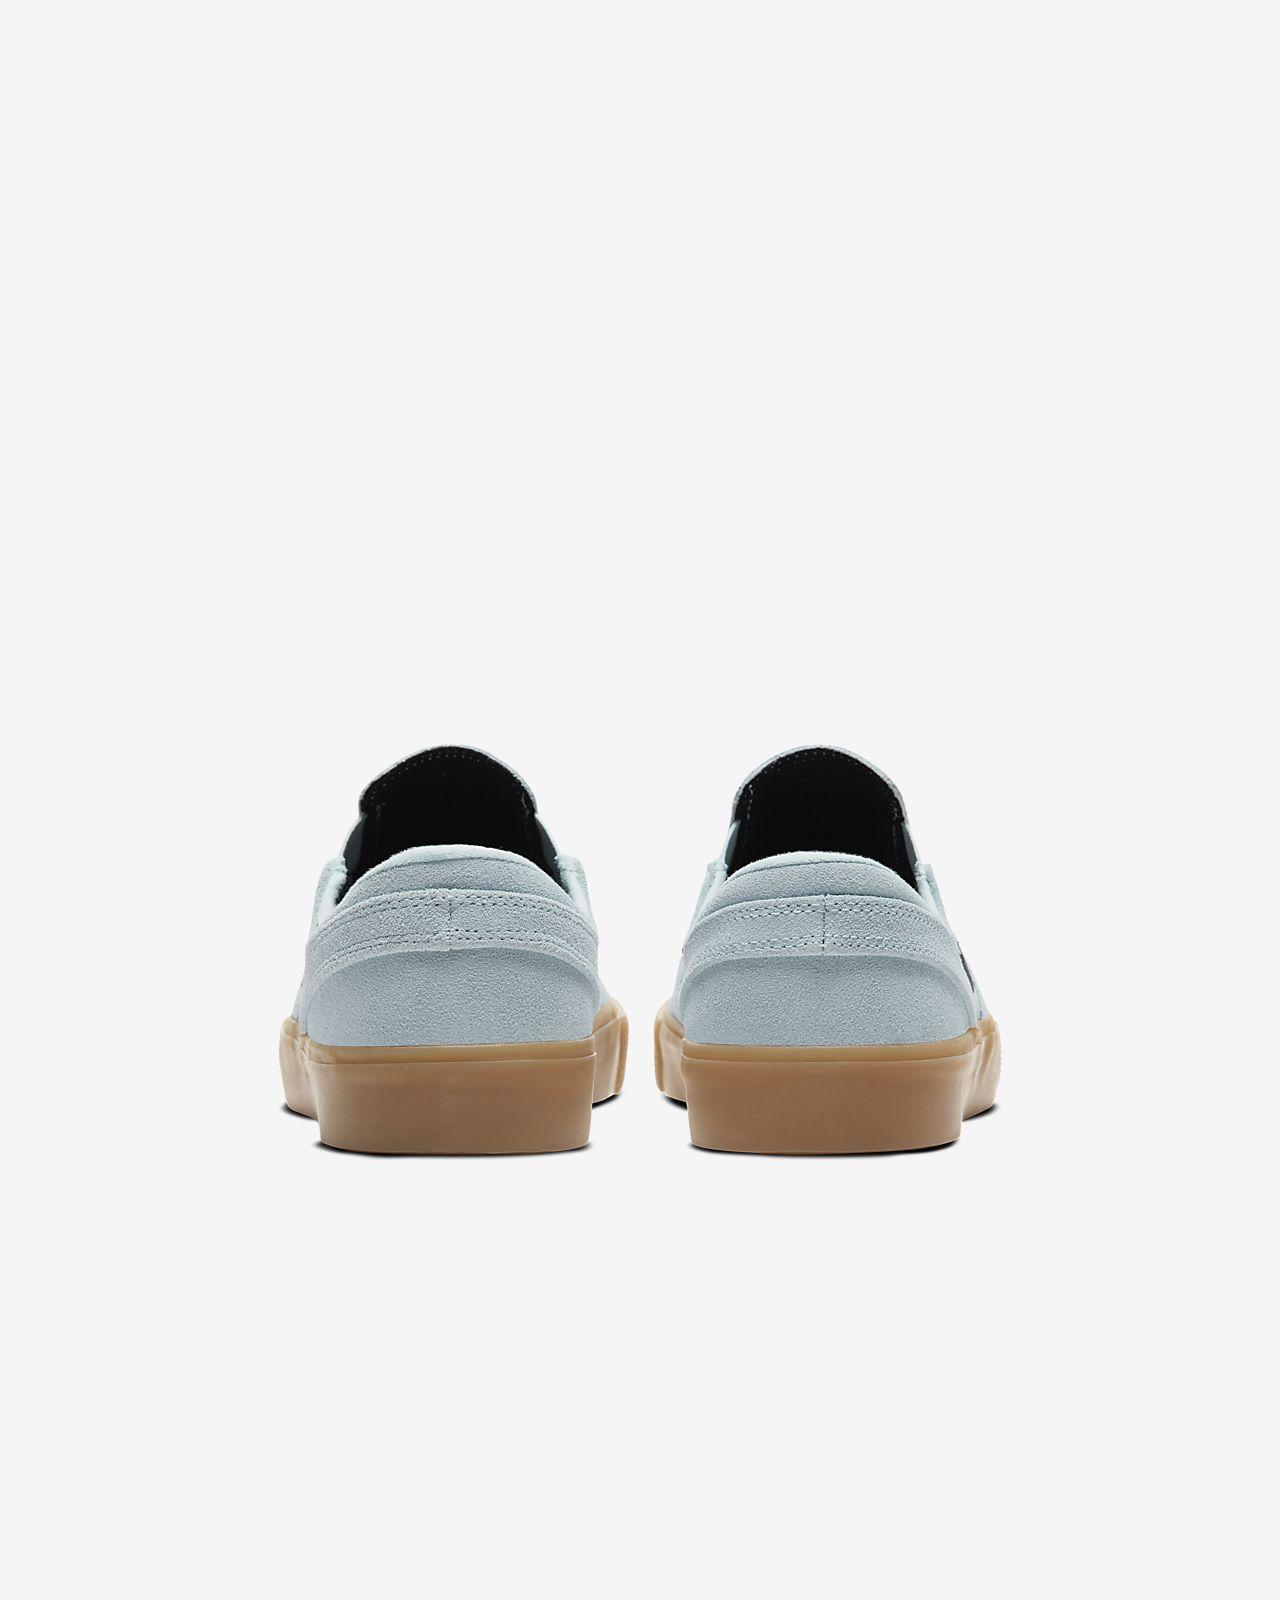 Nike SB ZOOM STEFAN JANOSKI SLIP RM | AQ7941 401